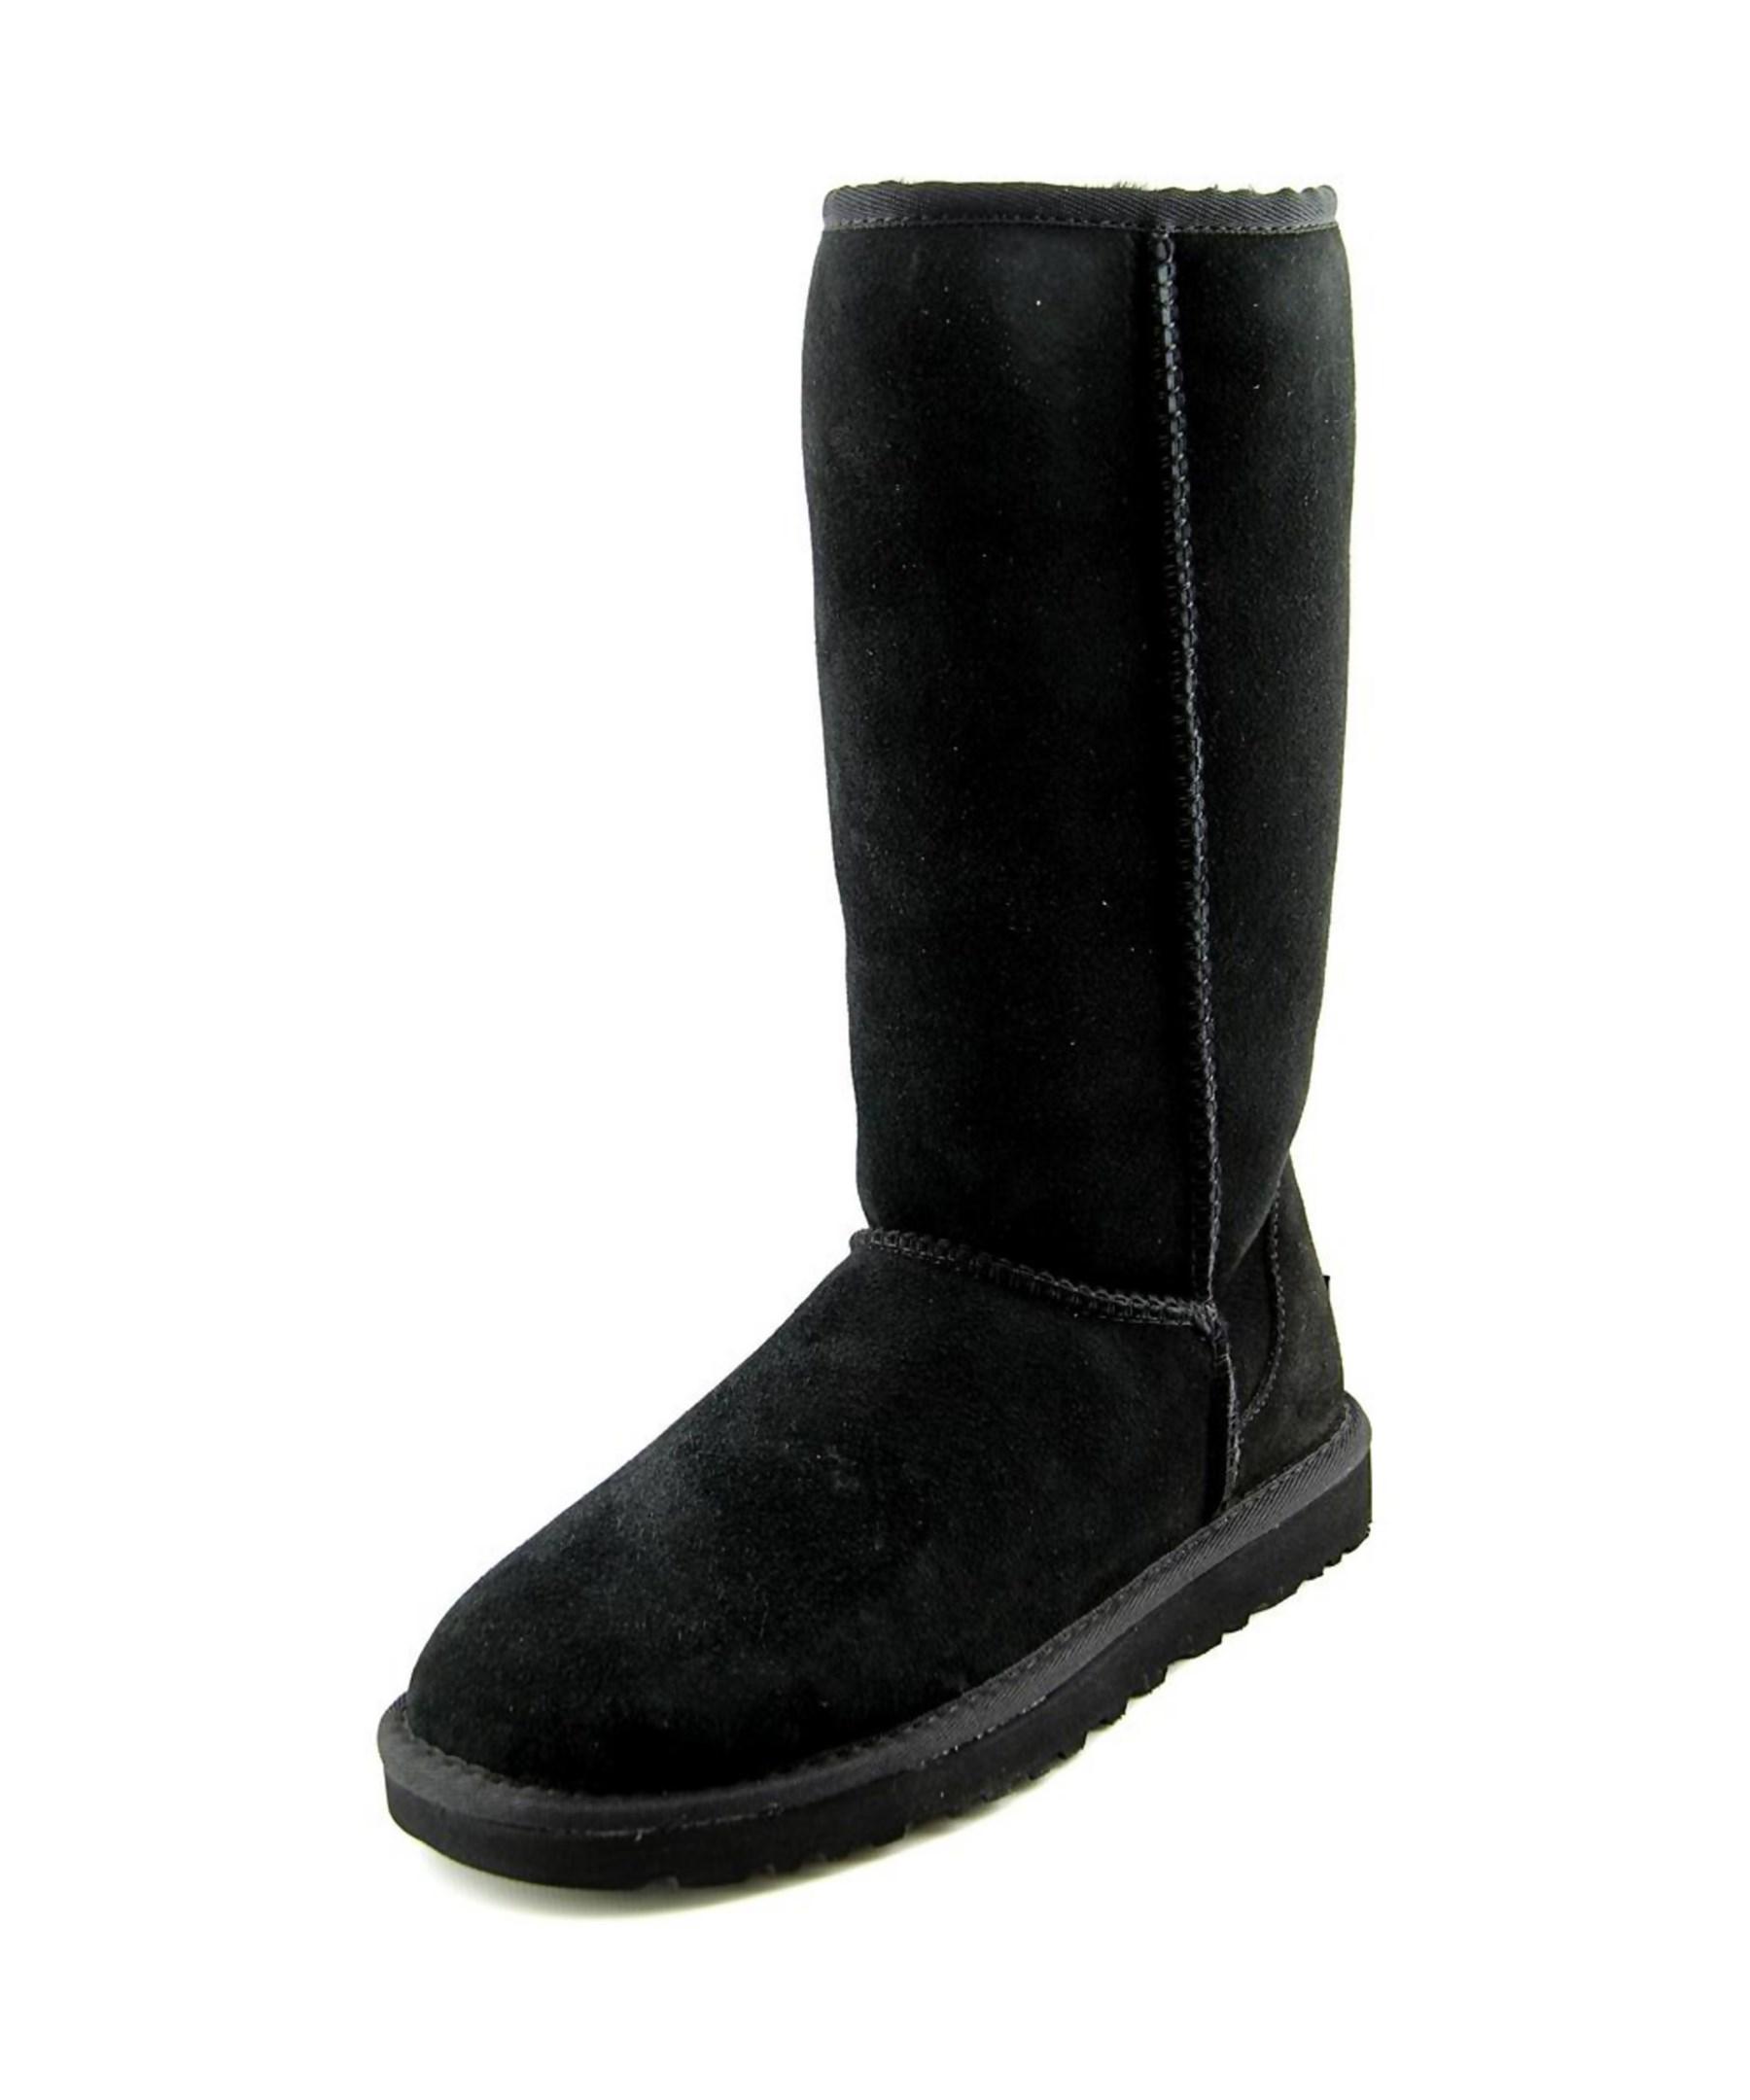 2c8779cd417 Womens Classic Tall Ugg Boots Black - cheap watches mgc-gas.com